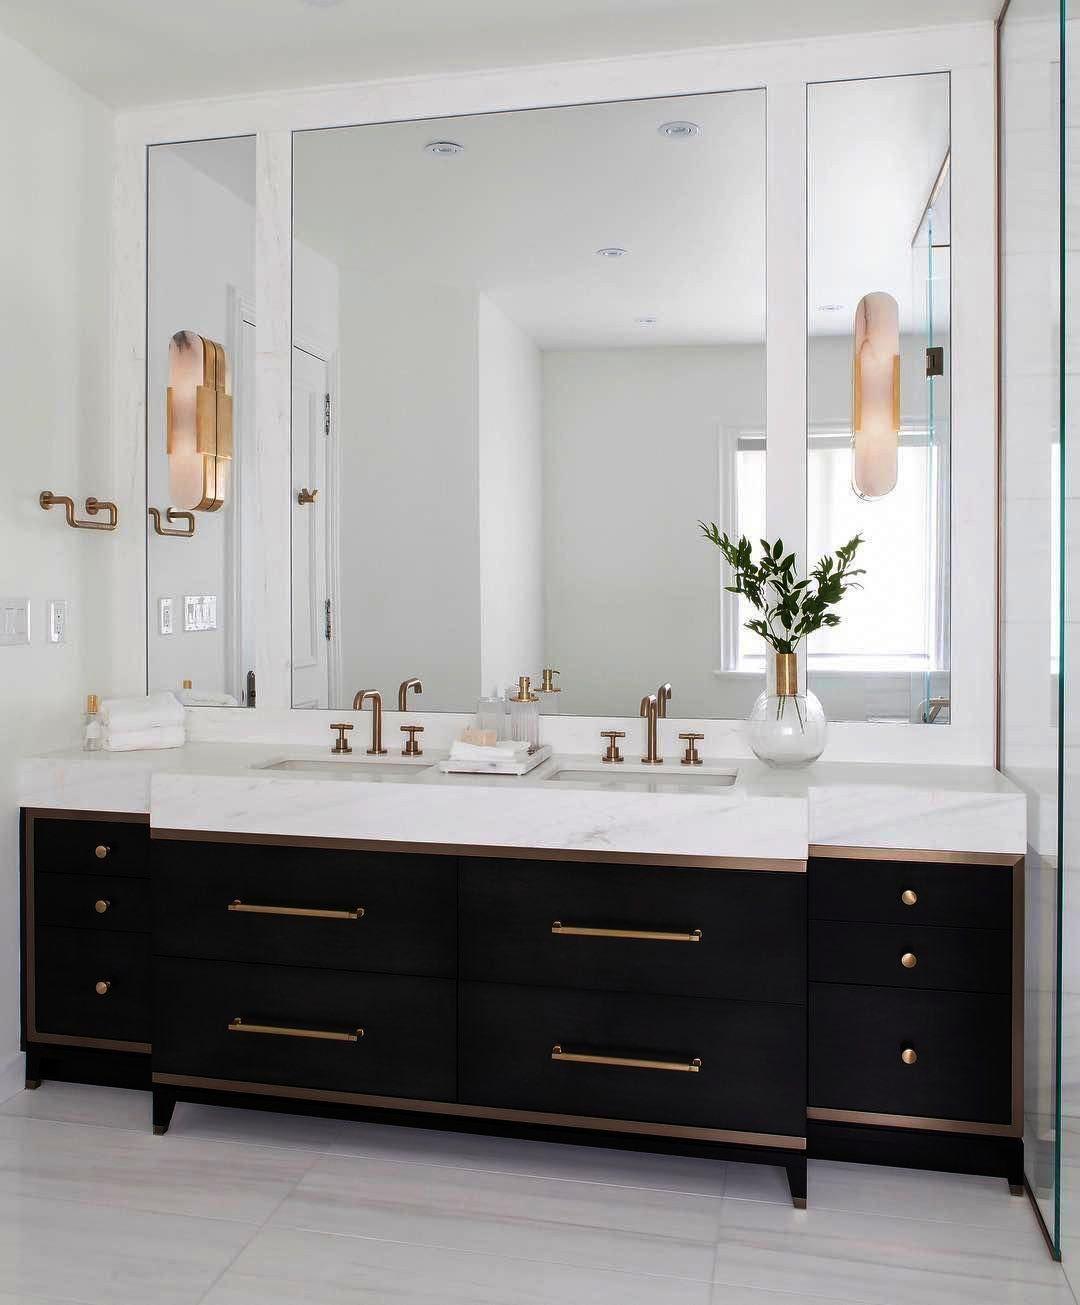 Bathroom Tile How To This Bathroom Decor Rustic Minus Bathroom